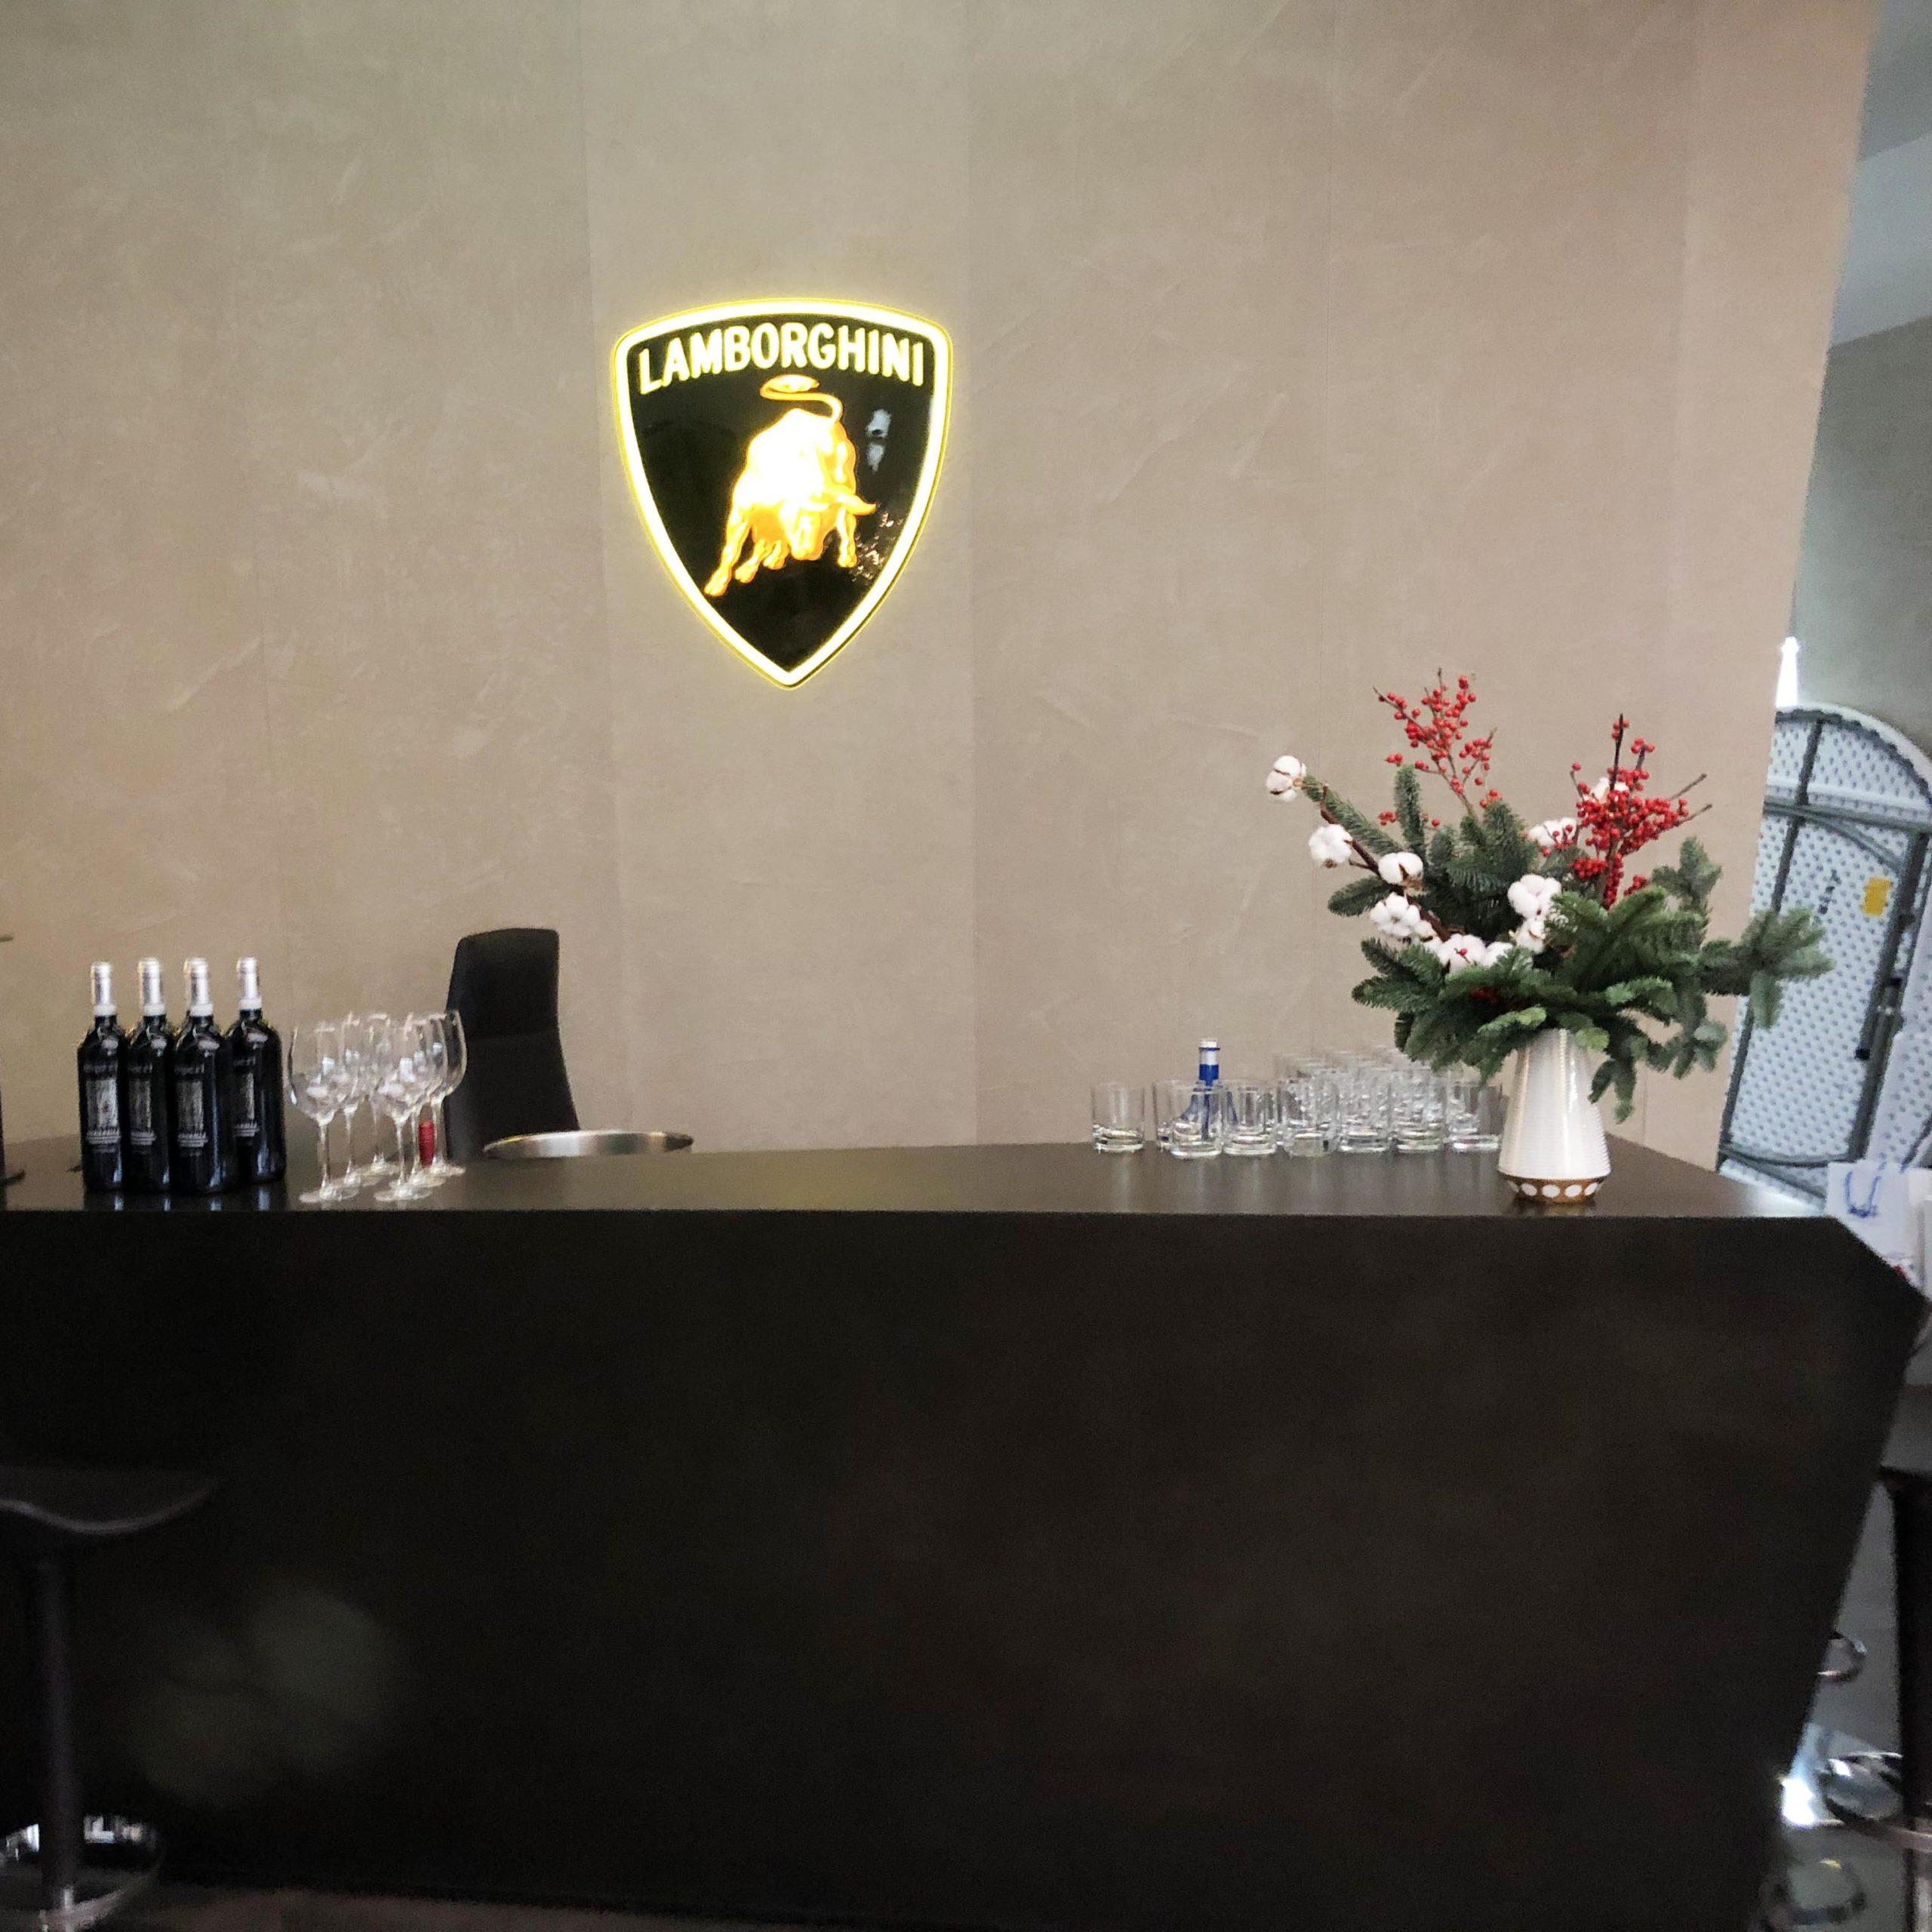 Новогоднее украшение интерьера (заказчик Lamborghini Avtodom)